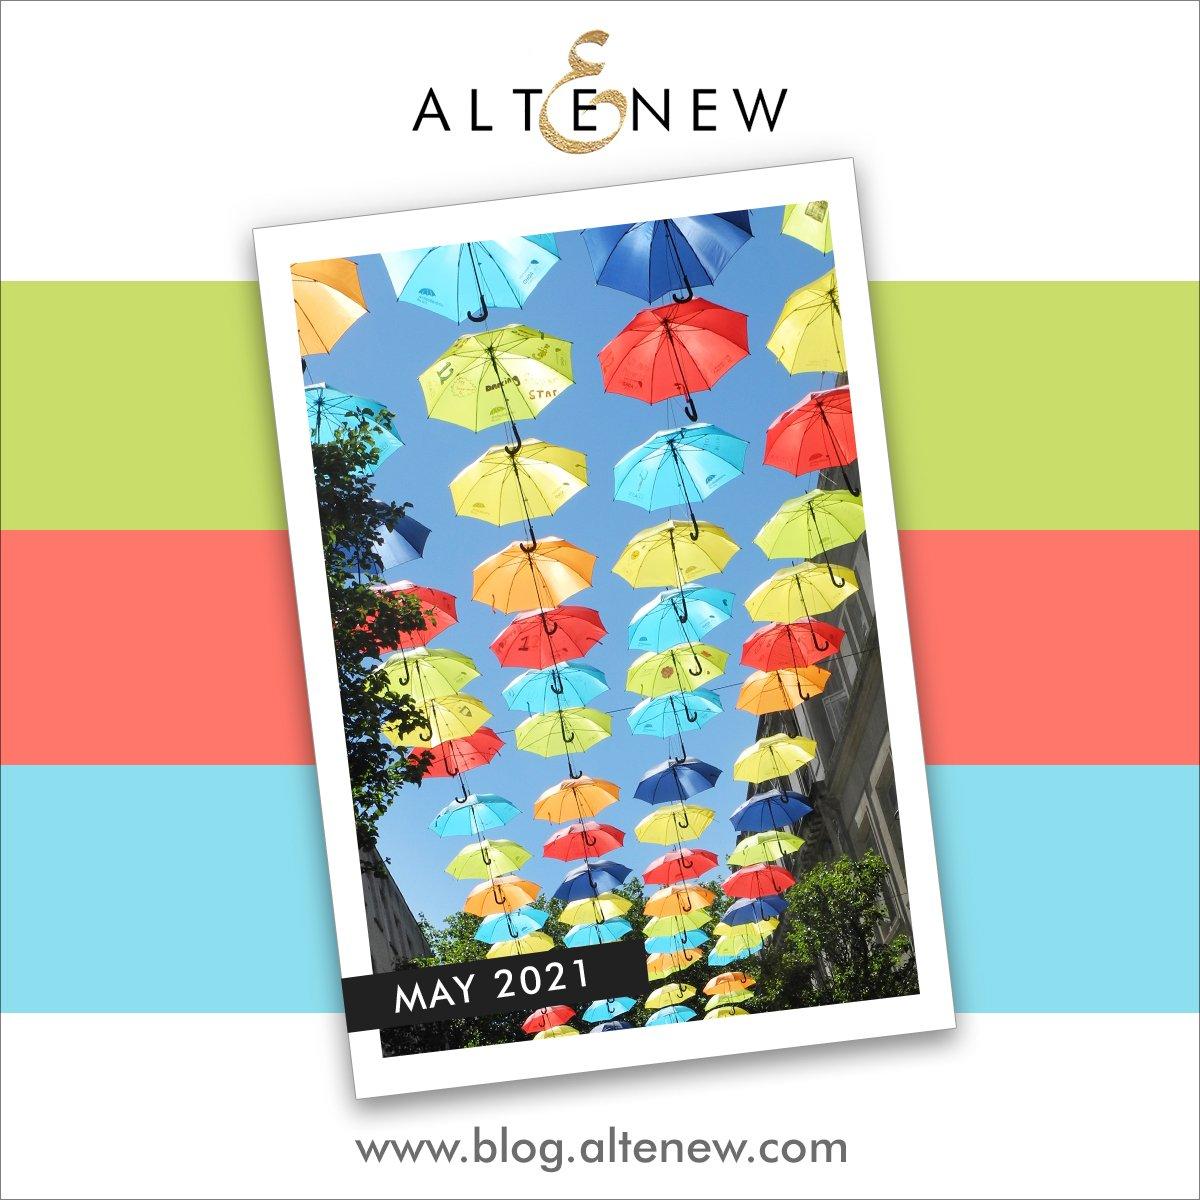 Altenew-May Inspiration Challenge 2021-05-02